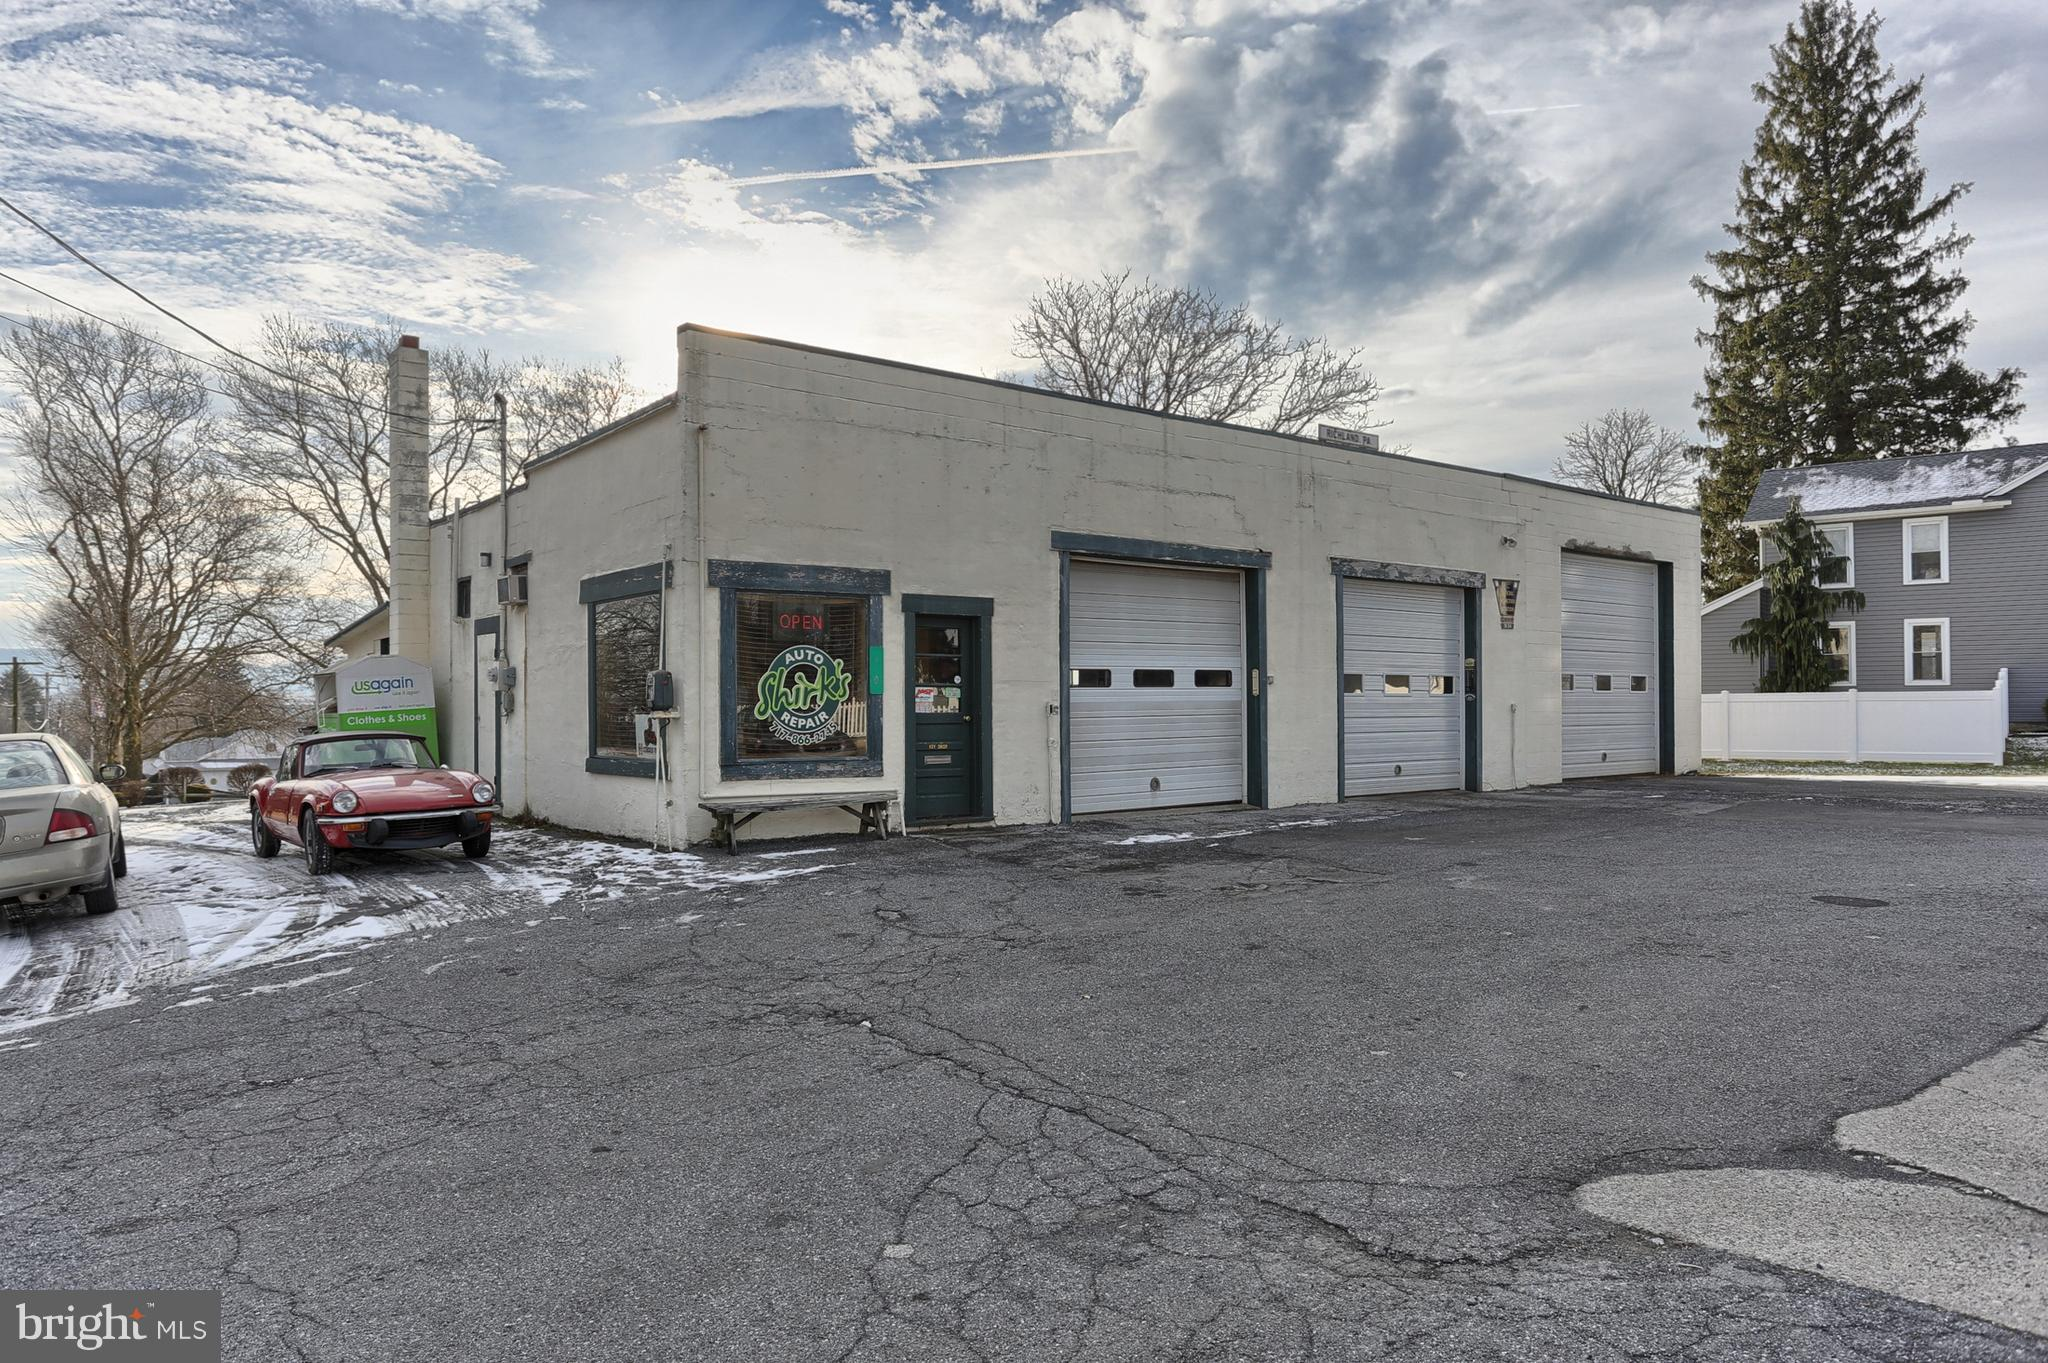 20 CHESTNUT STREET, RICHLAND, PA 17087